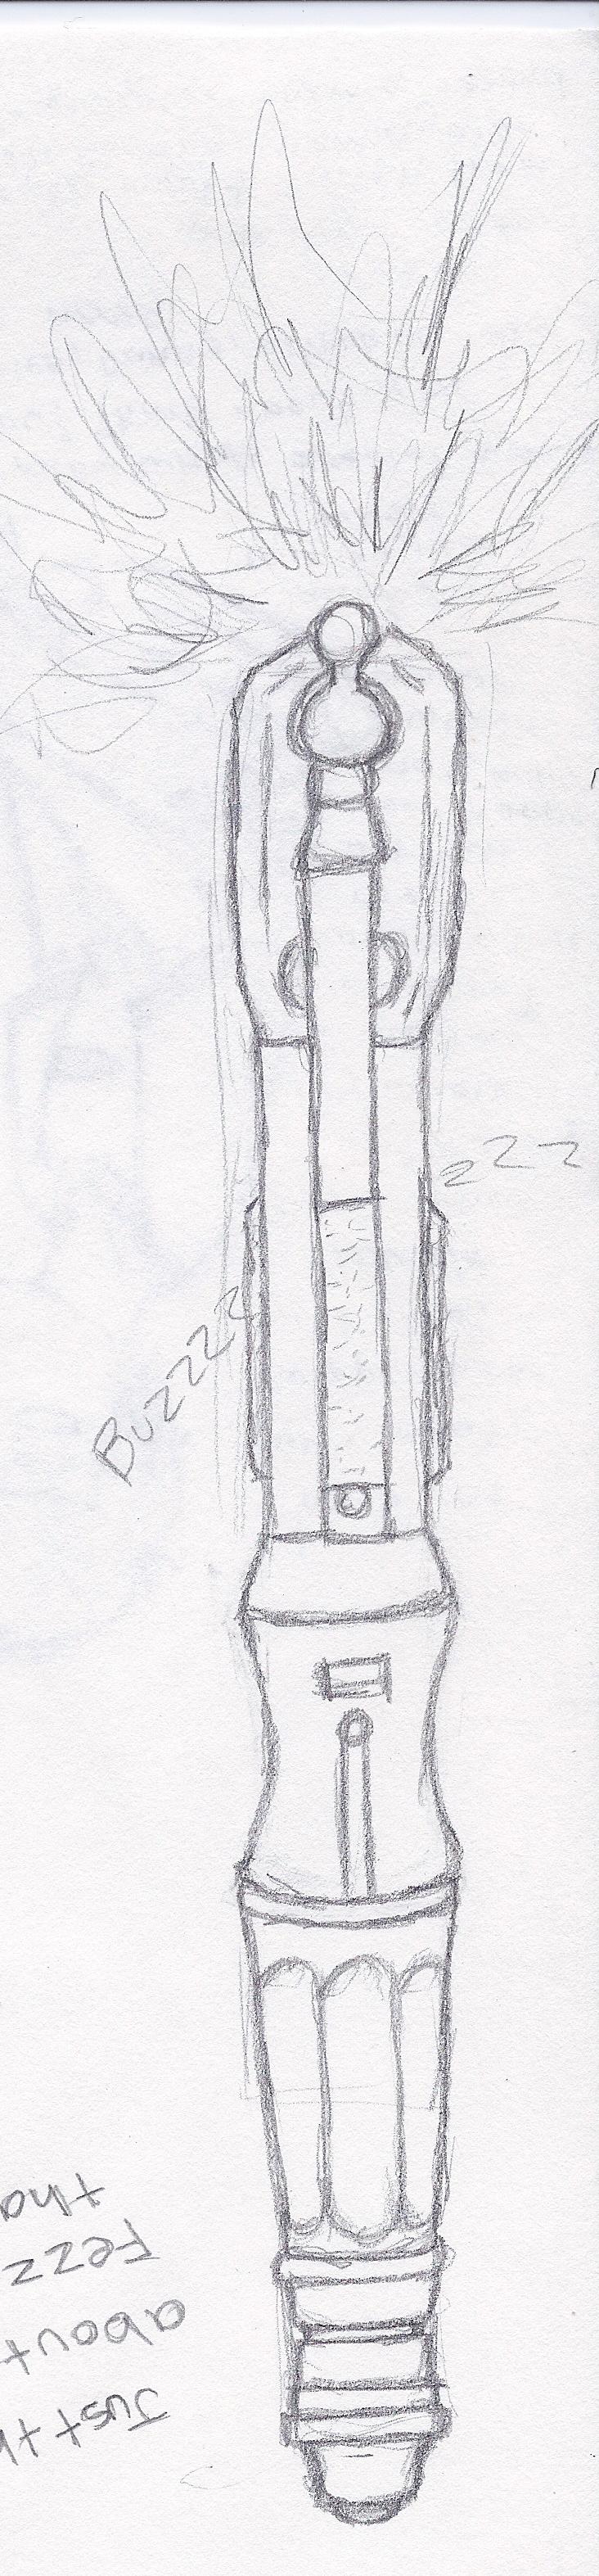 Sonic screwdriver (11th) by Turkeyhead987 - 1431.6KB